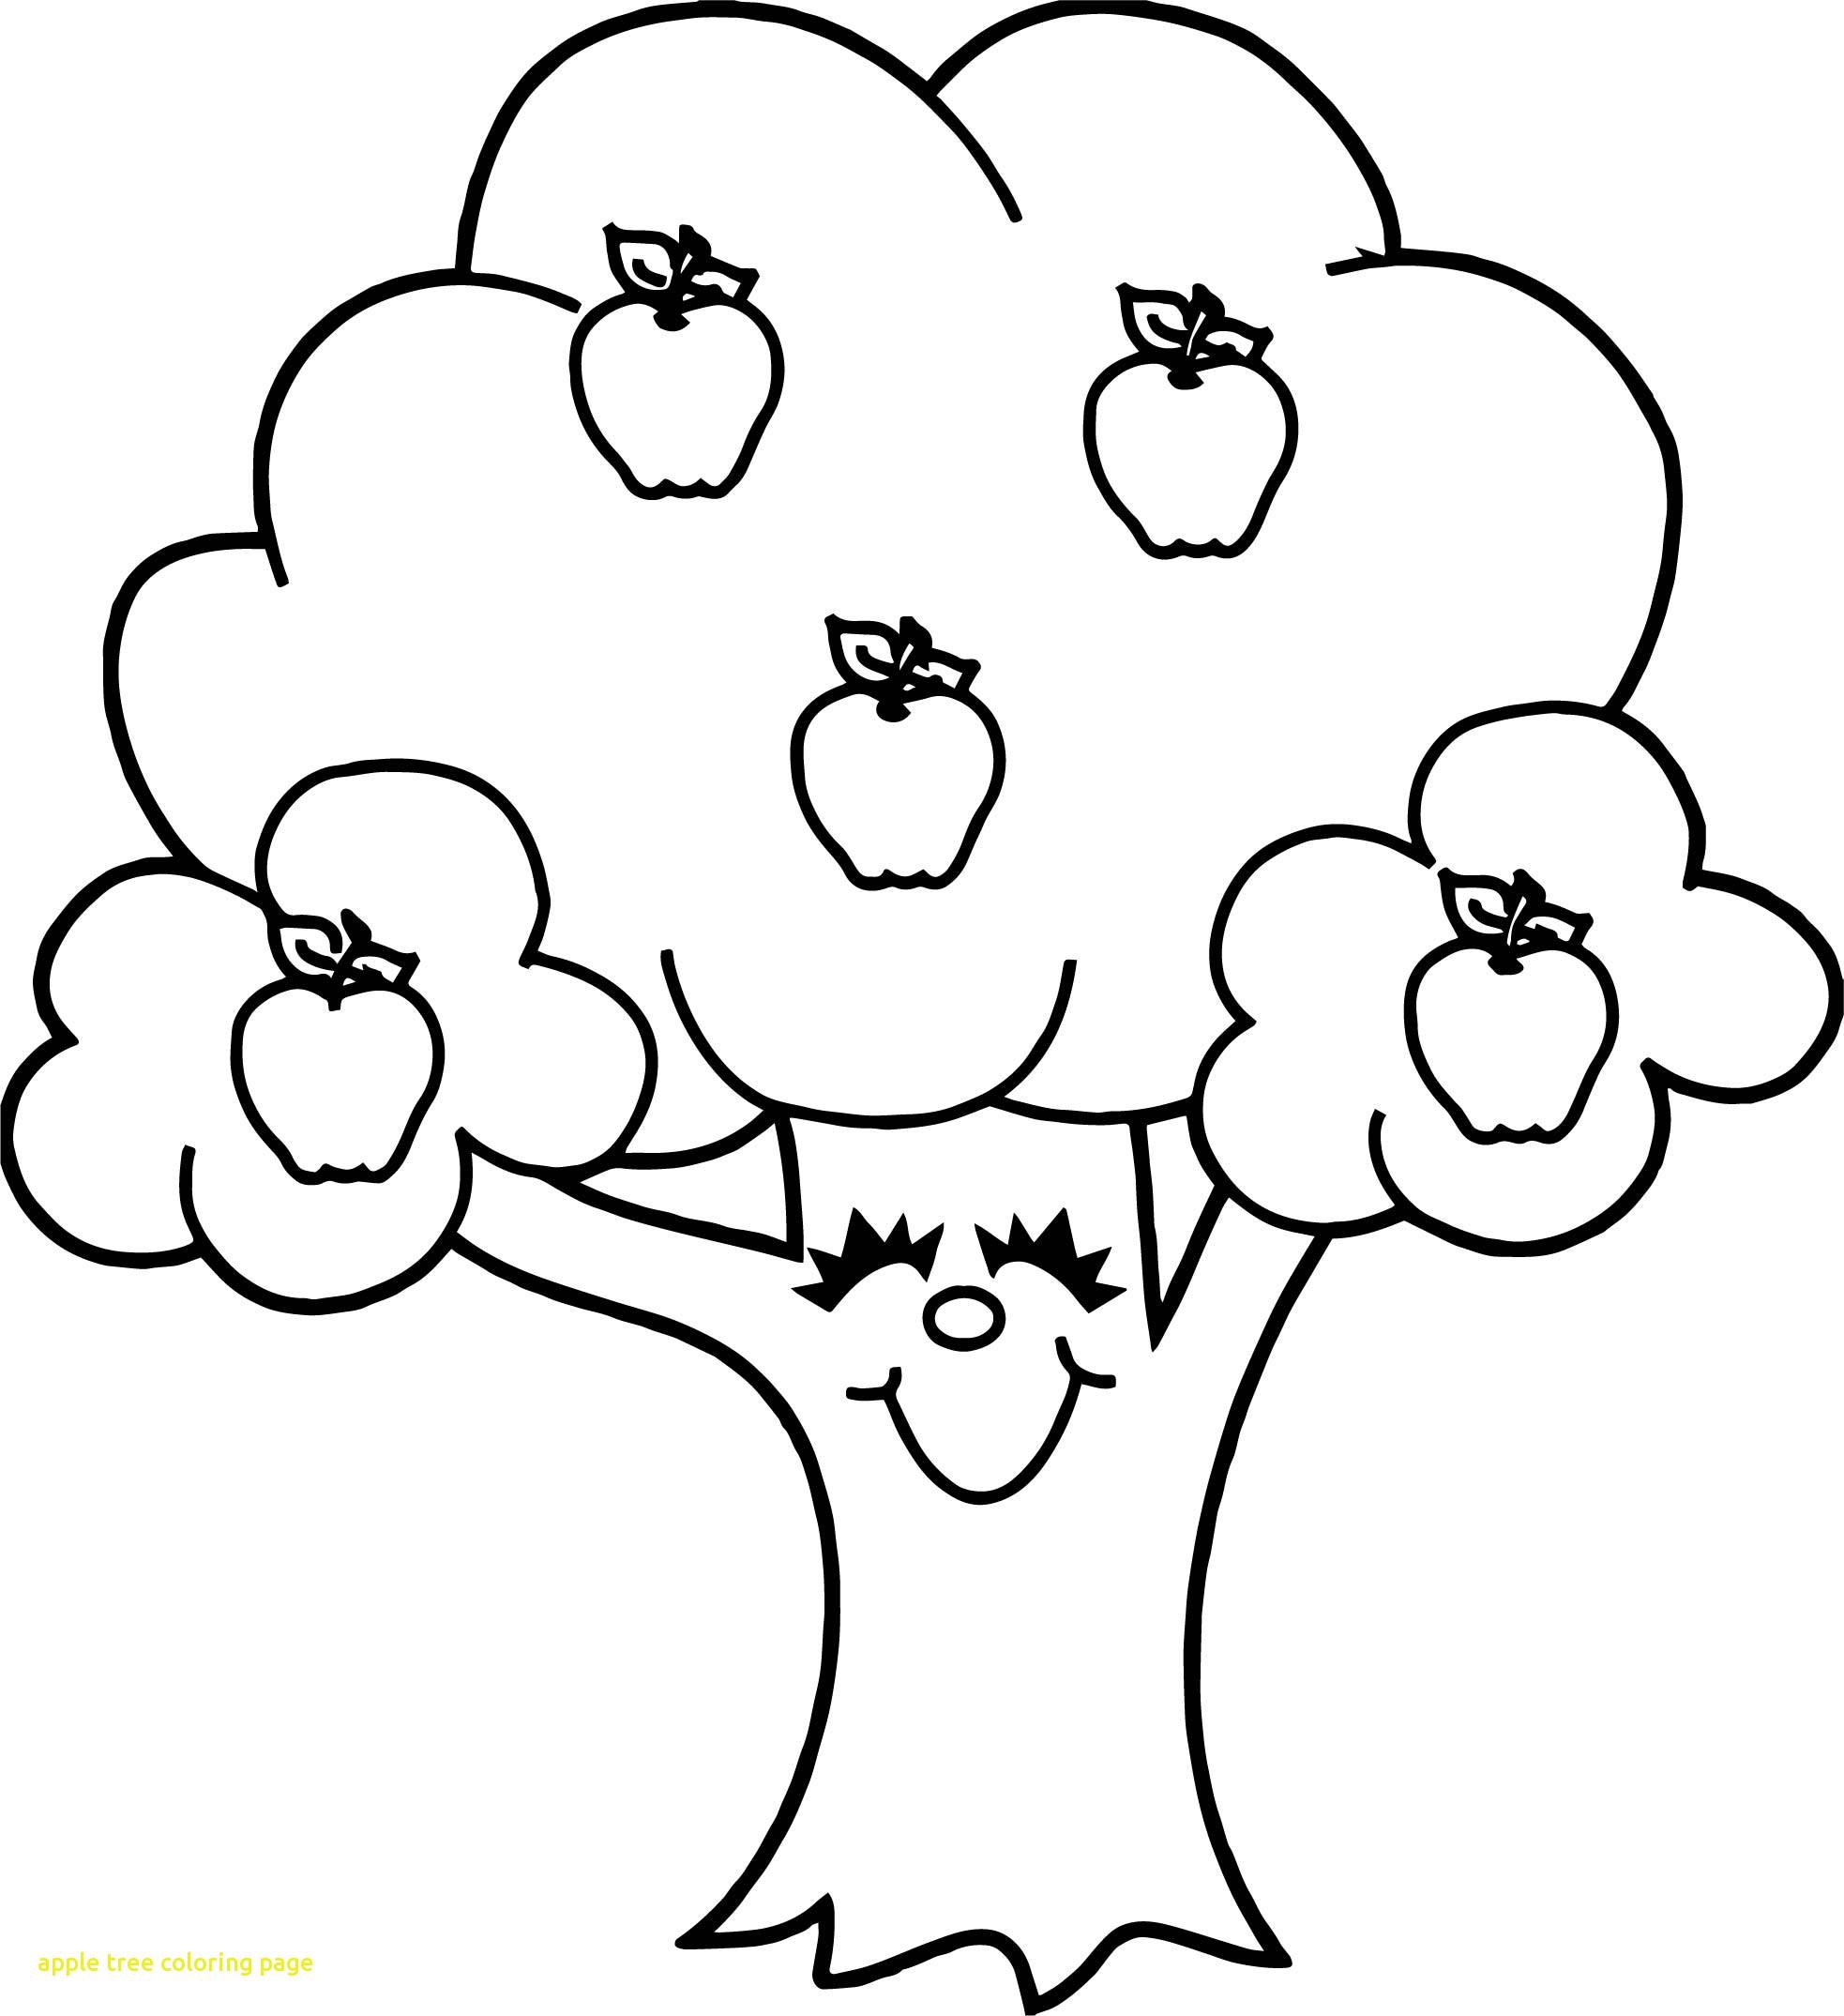 Dibujos De árbol De Manzana De Dibujos Animados Para